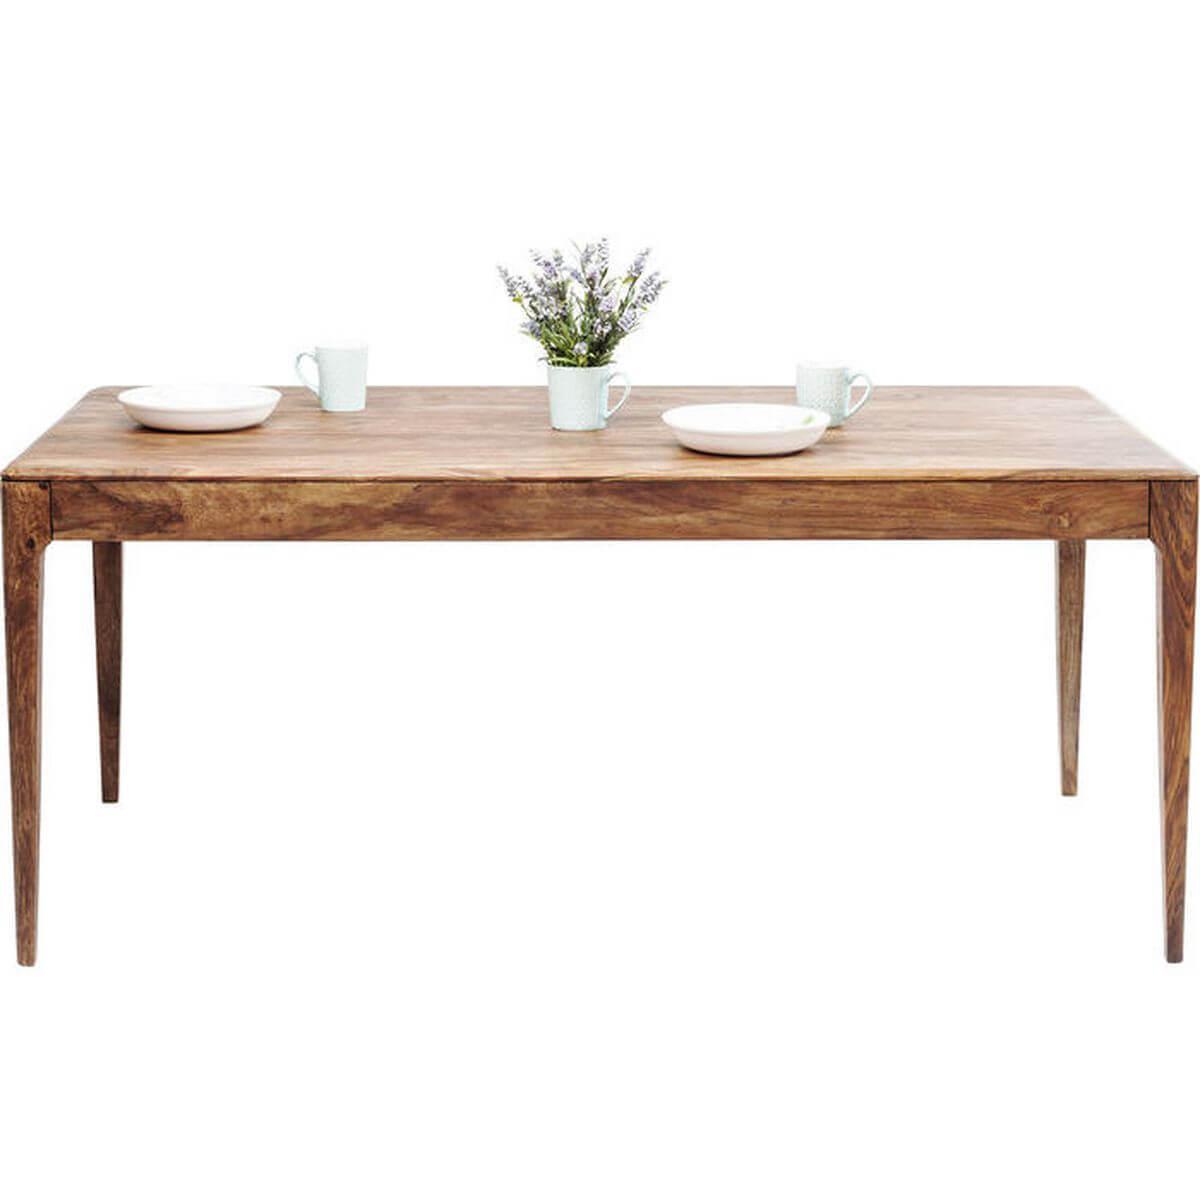 Table Brooklyn Nature Kare Design 200x100cm